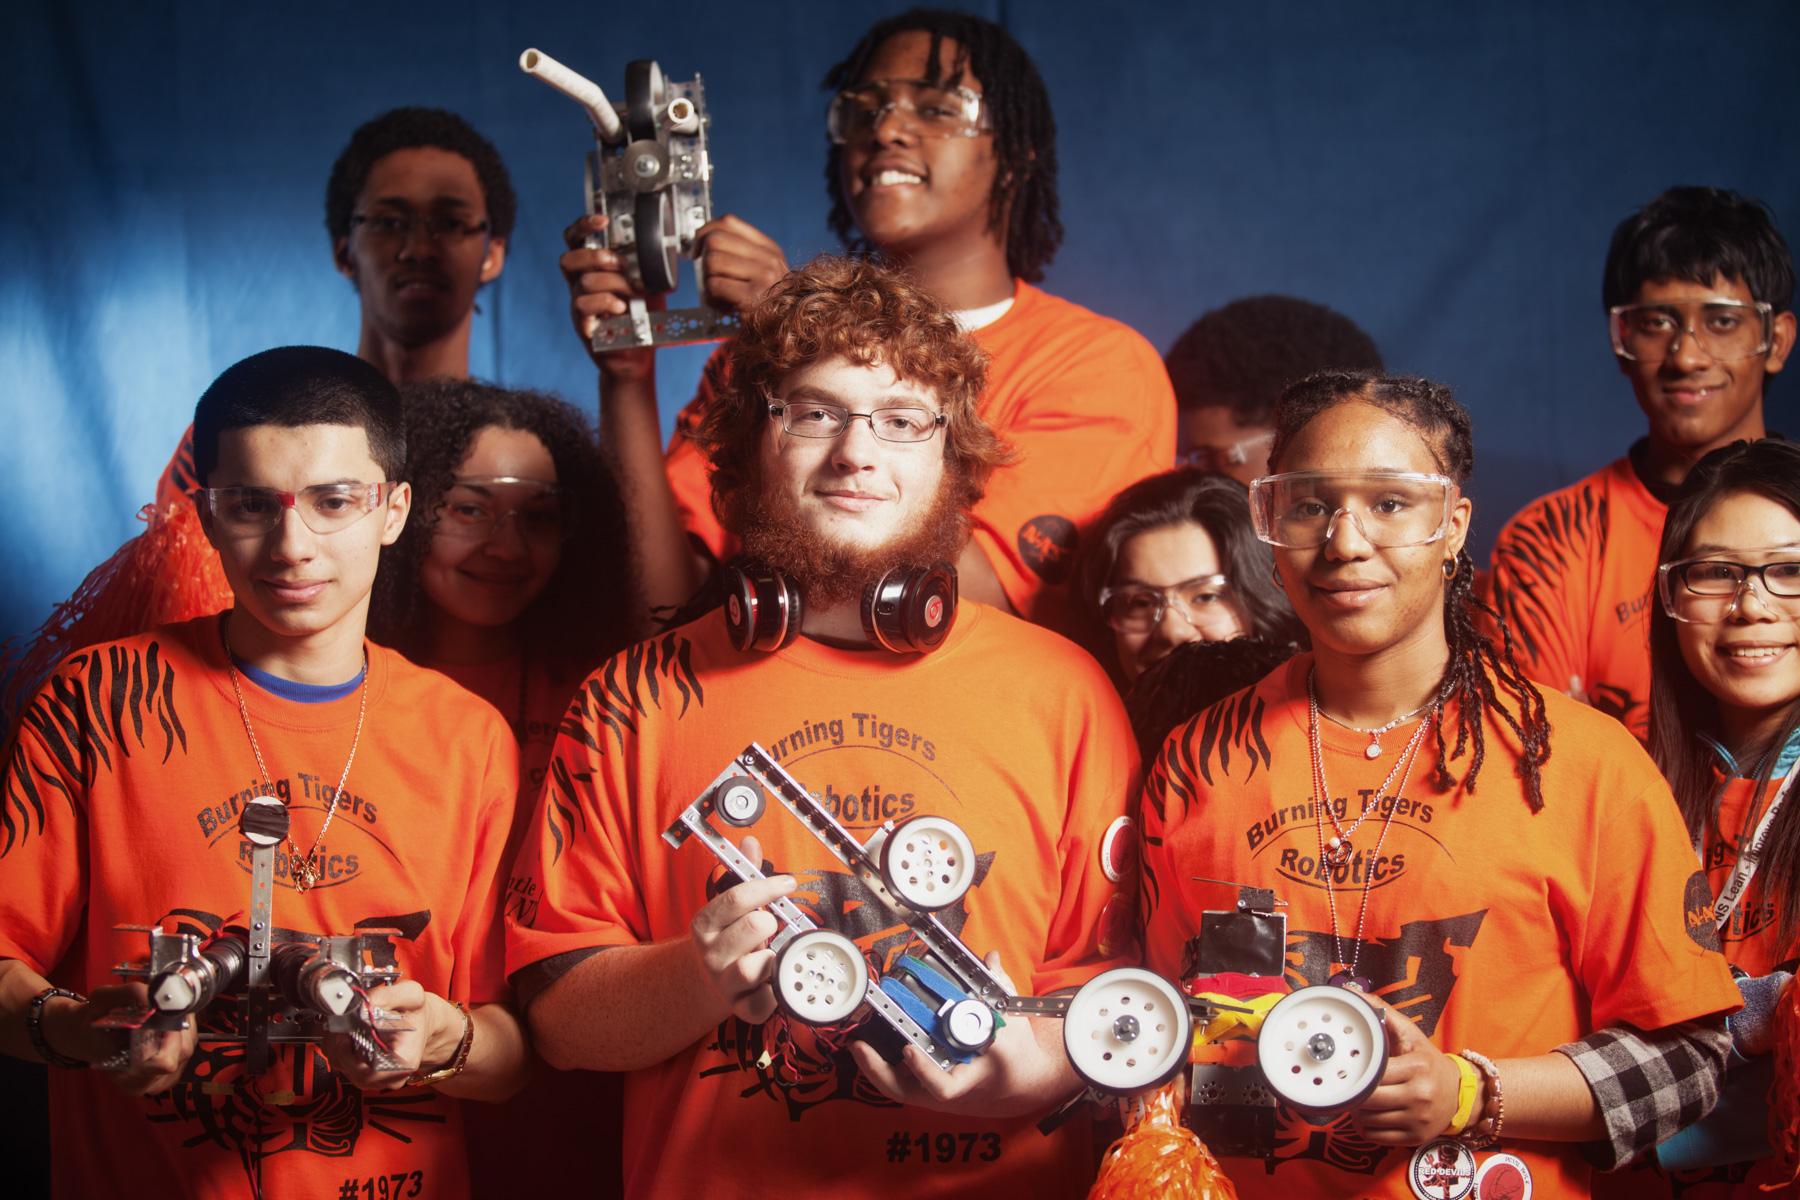 robotics-team-portrait-1.jpg